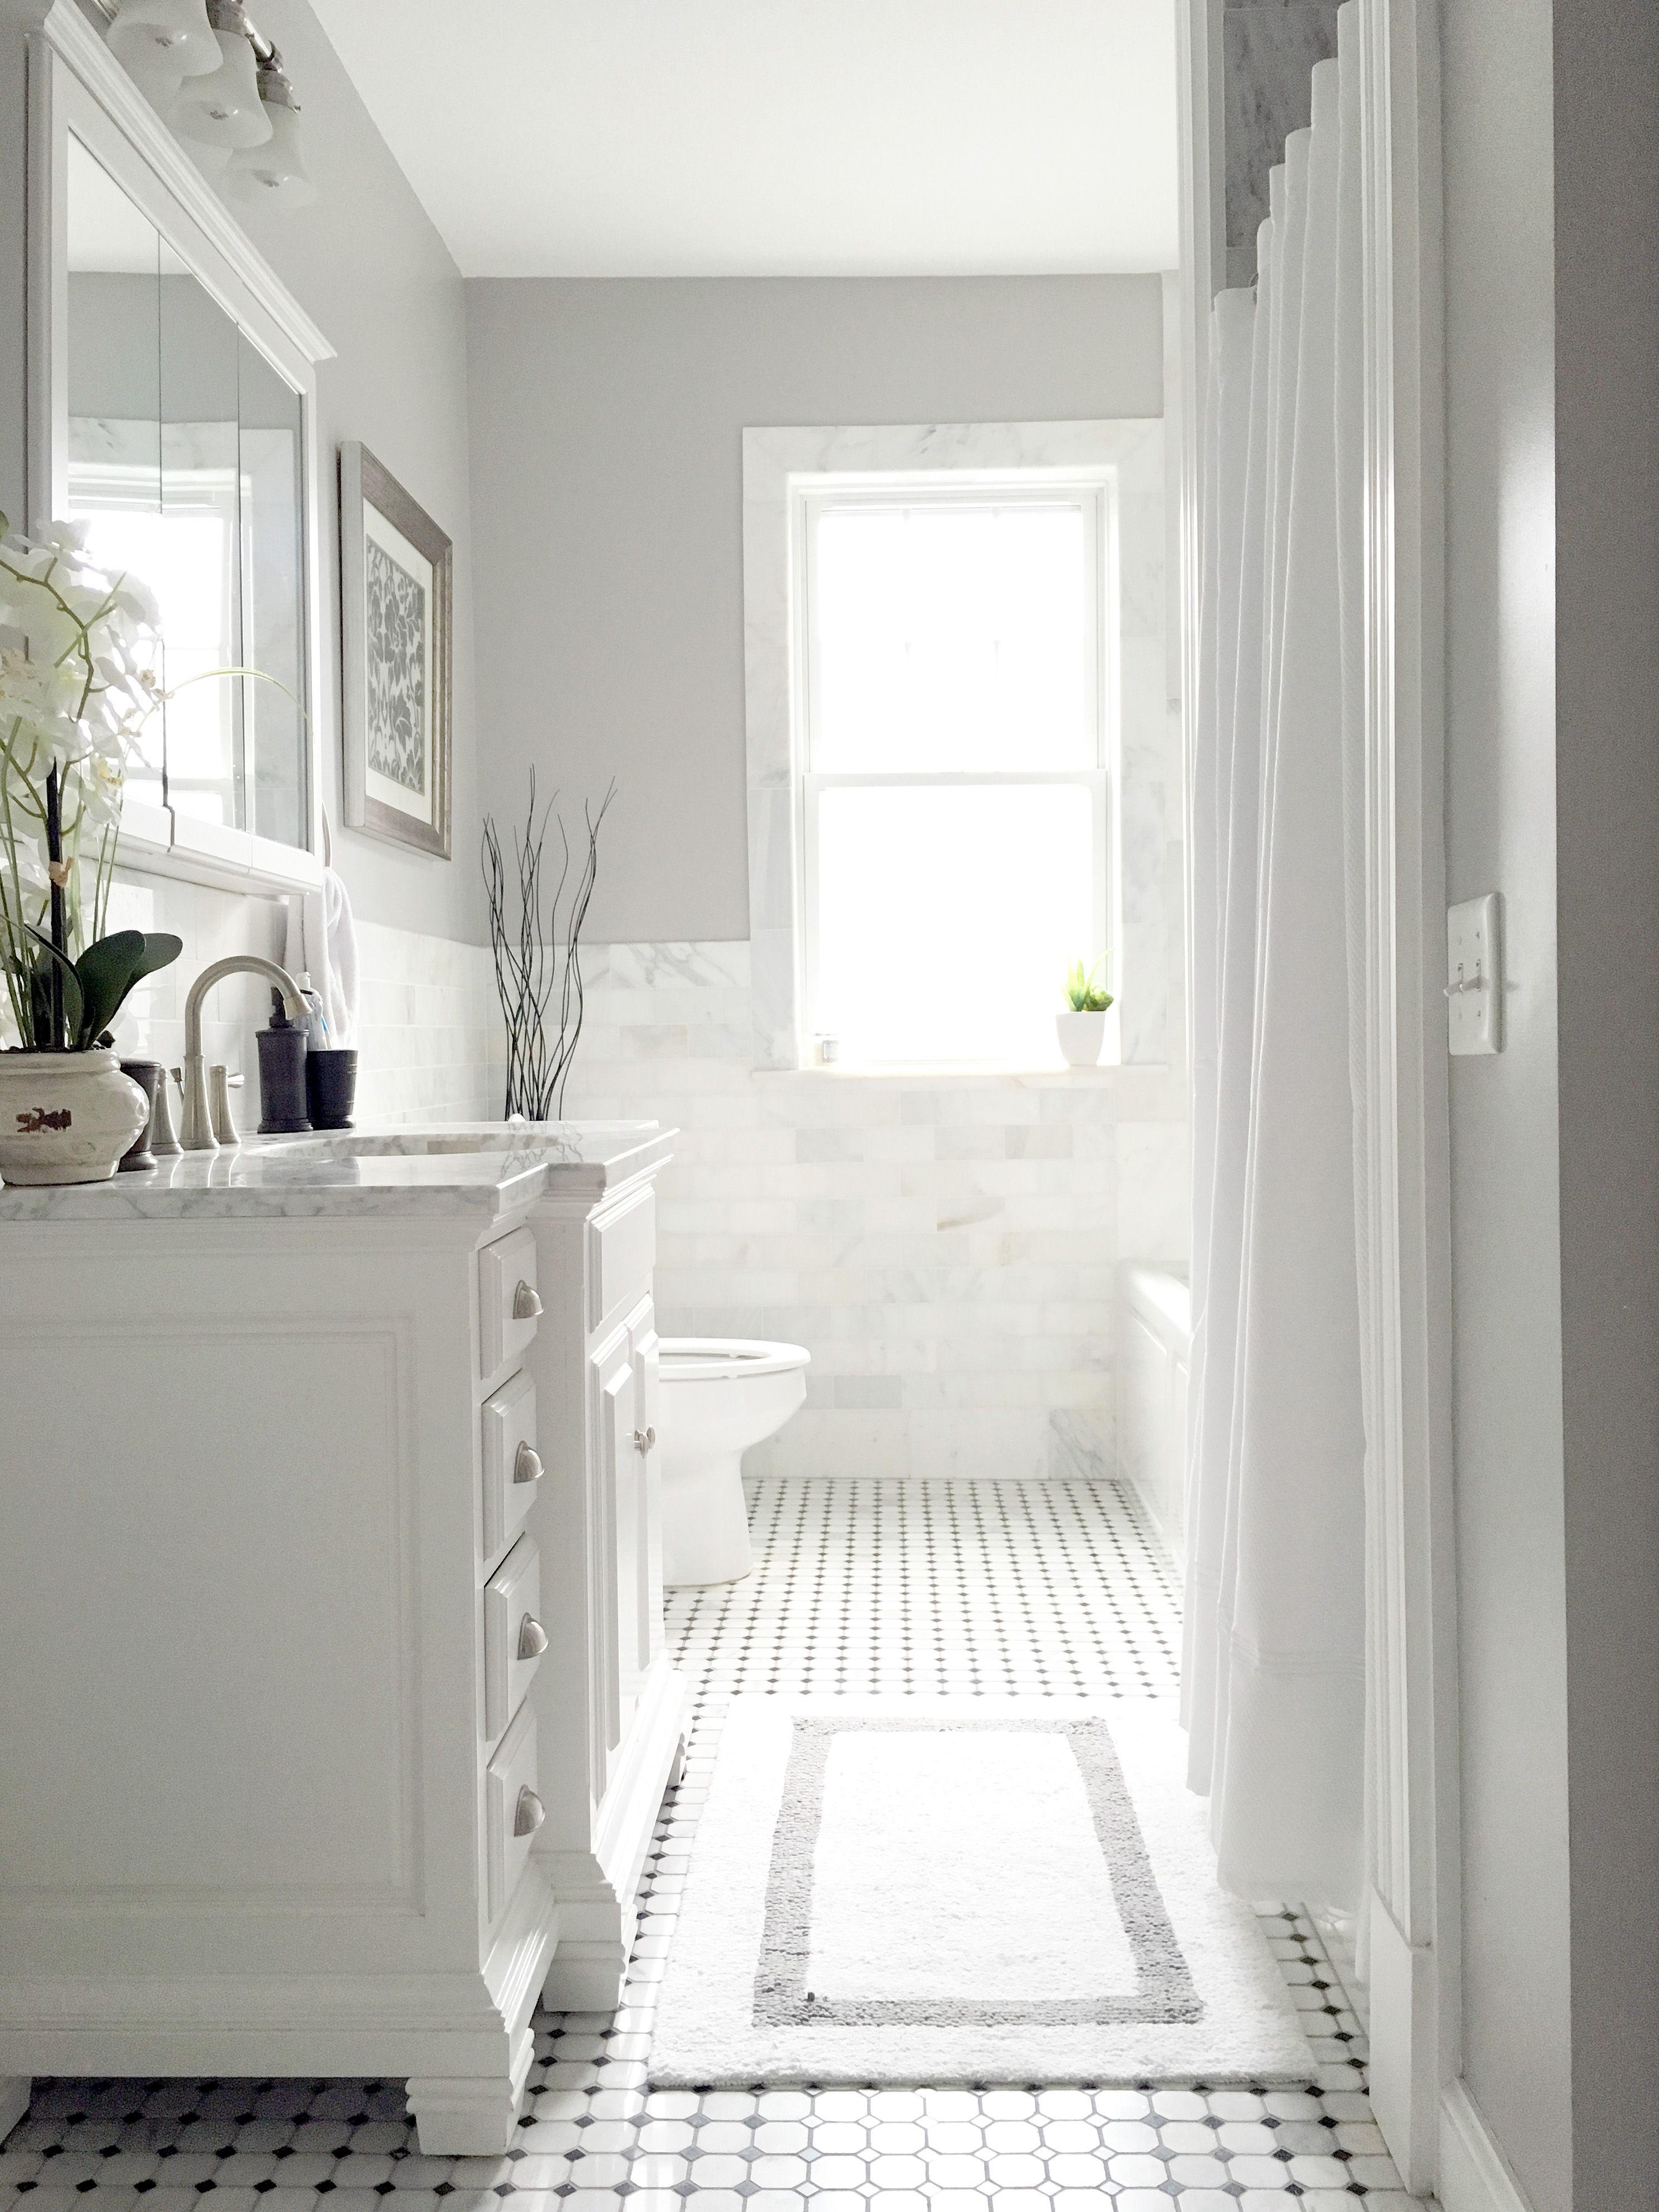 All White Bathroom Victorian Bathroom Modern Bathroom Marble Victorian Modern Glam Bathroom Dream Bathroom Bathroom Design New Homes Home